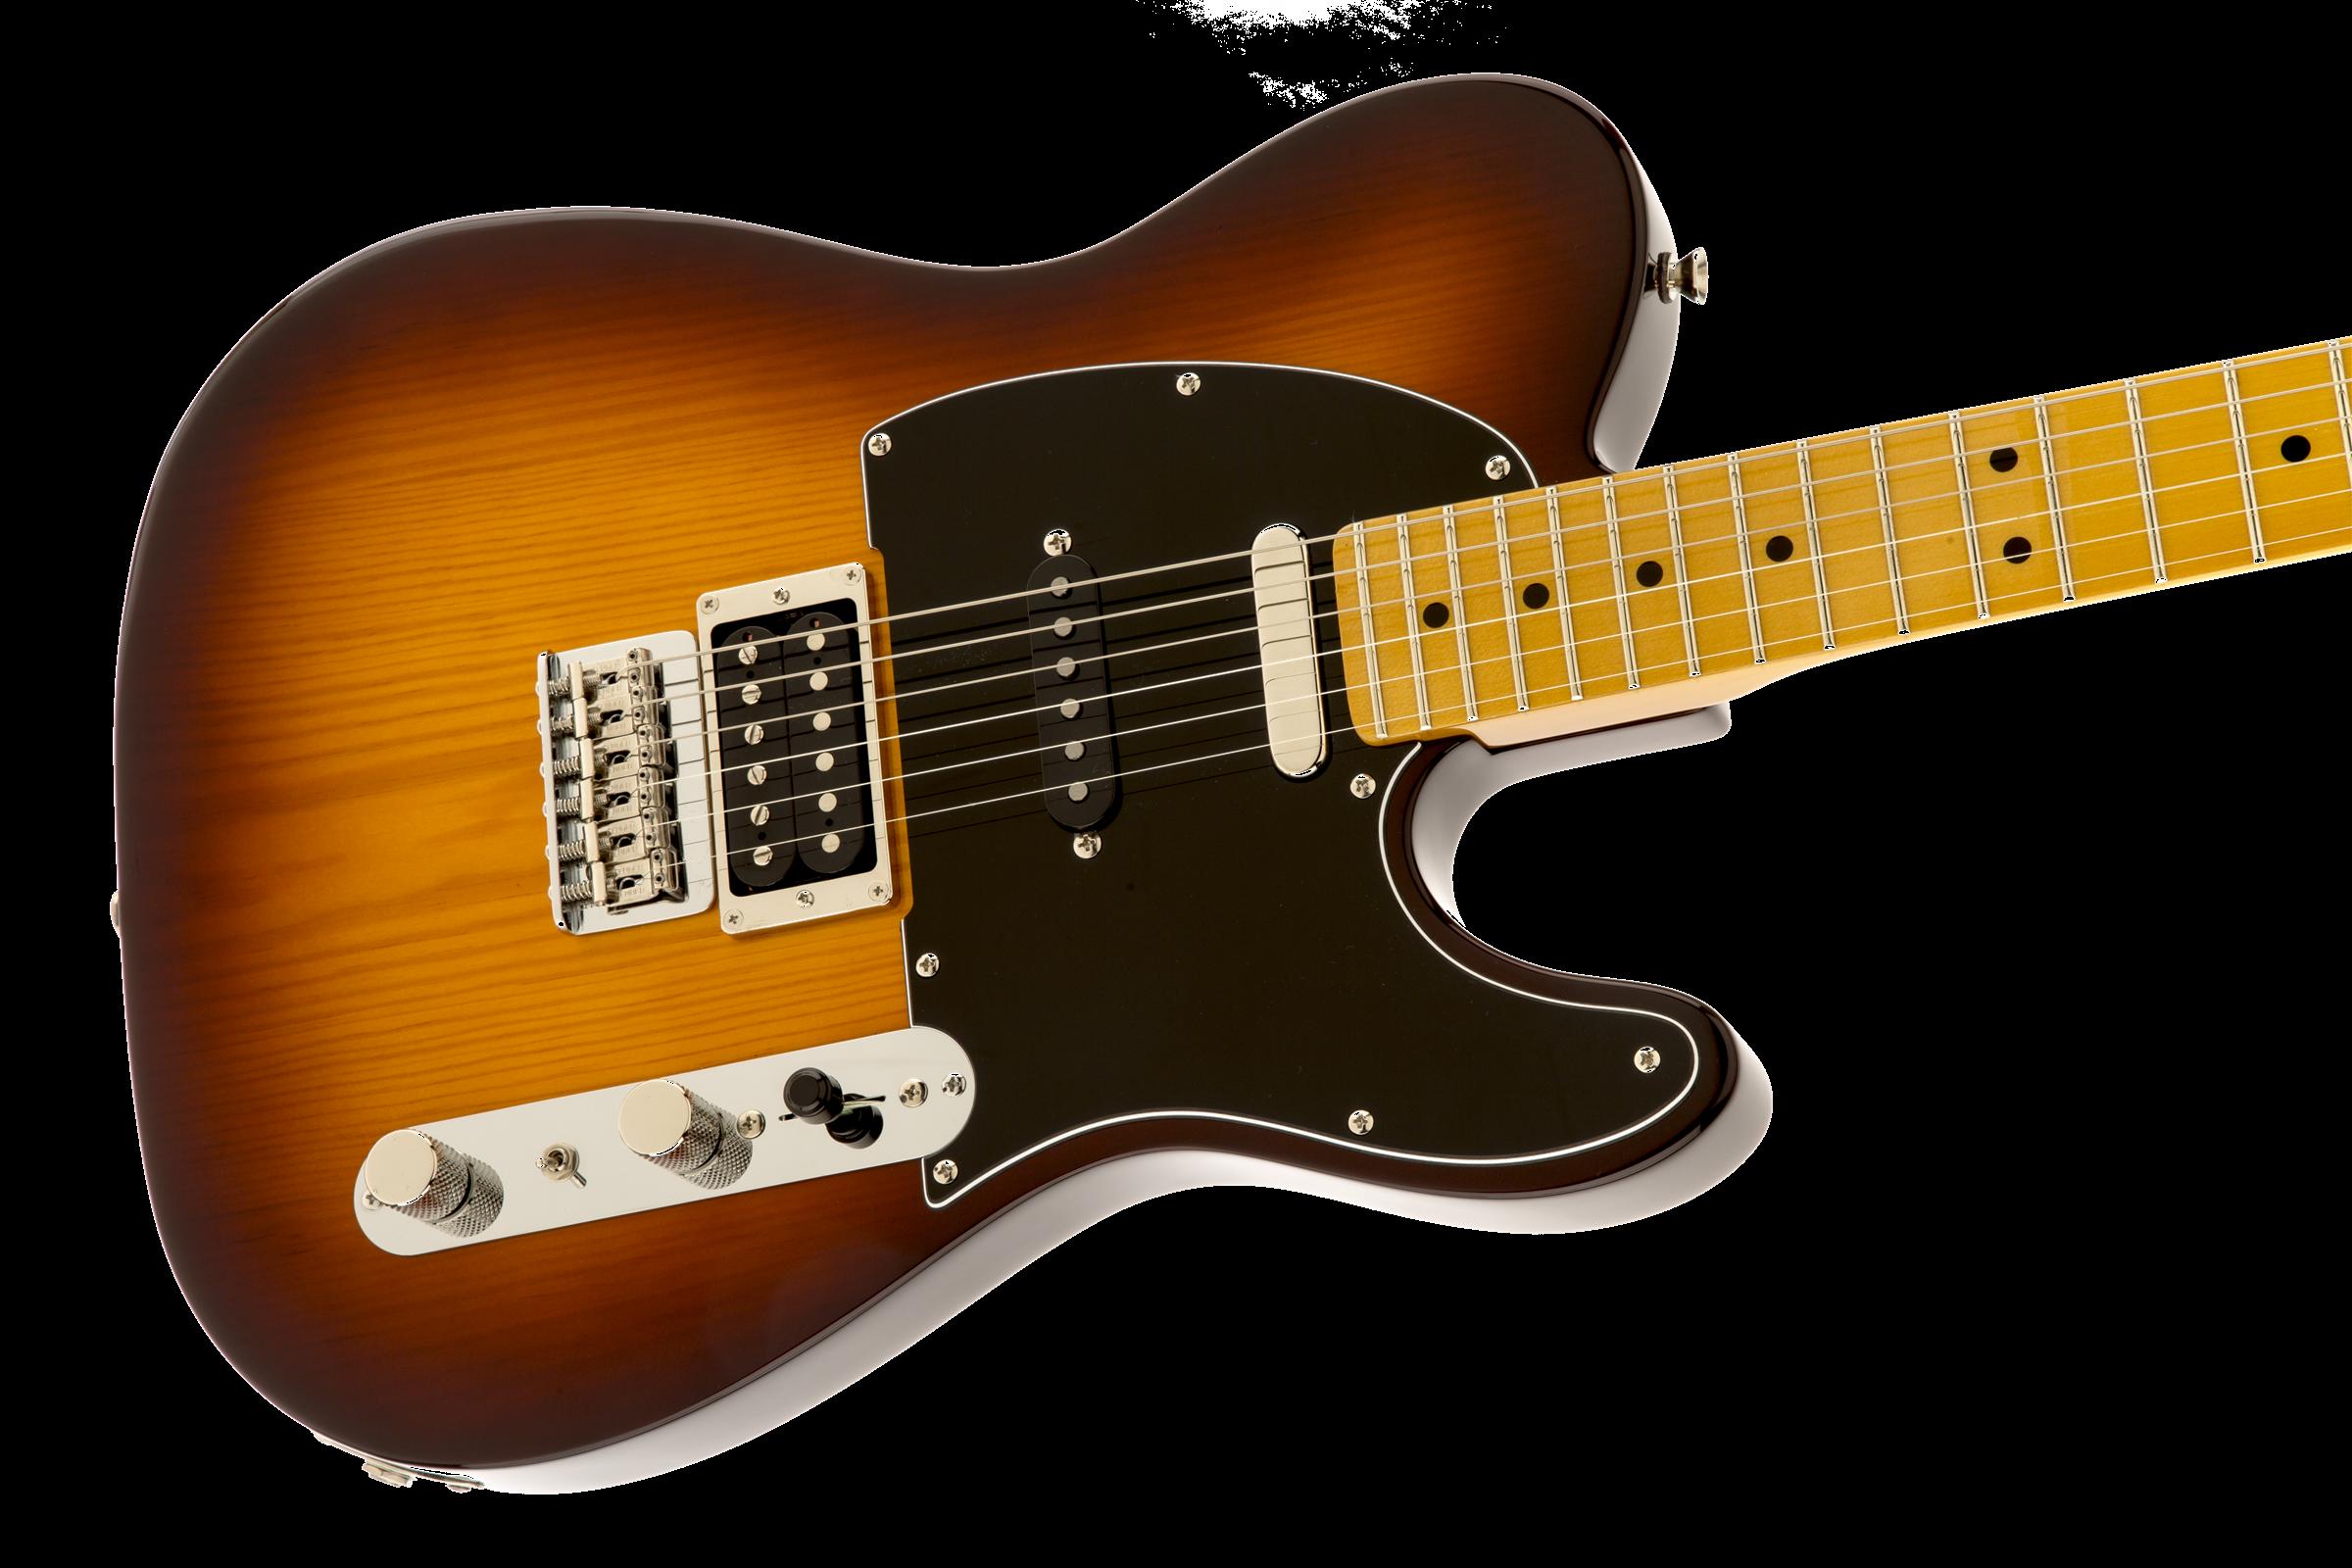 Modern Player Telecaster Plus Telecaster Electric Guitars Fender Guitars Telecaster Guitar Electric Guitar